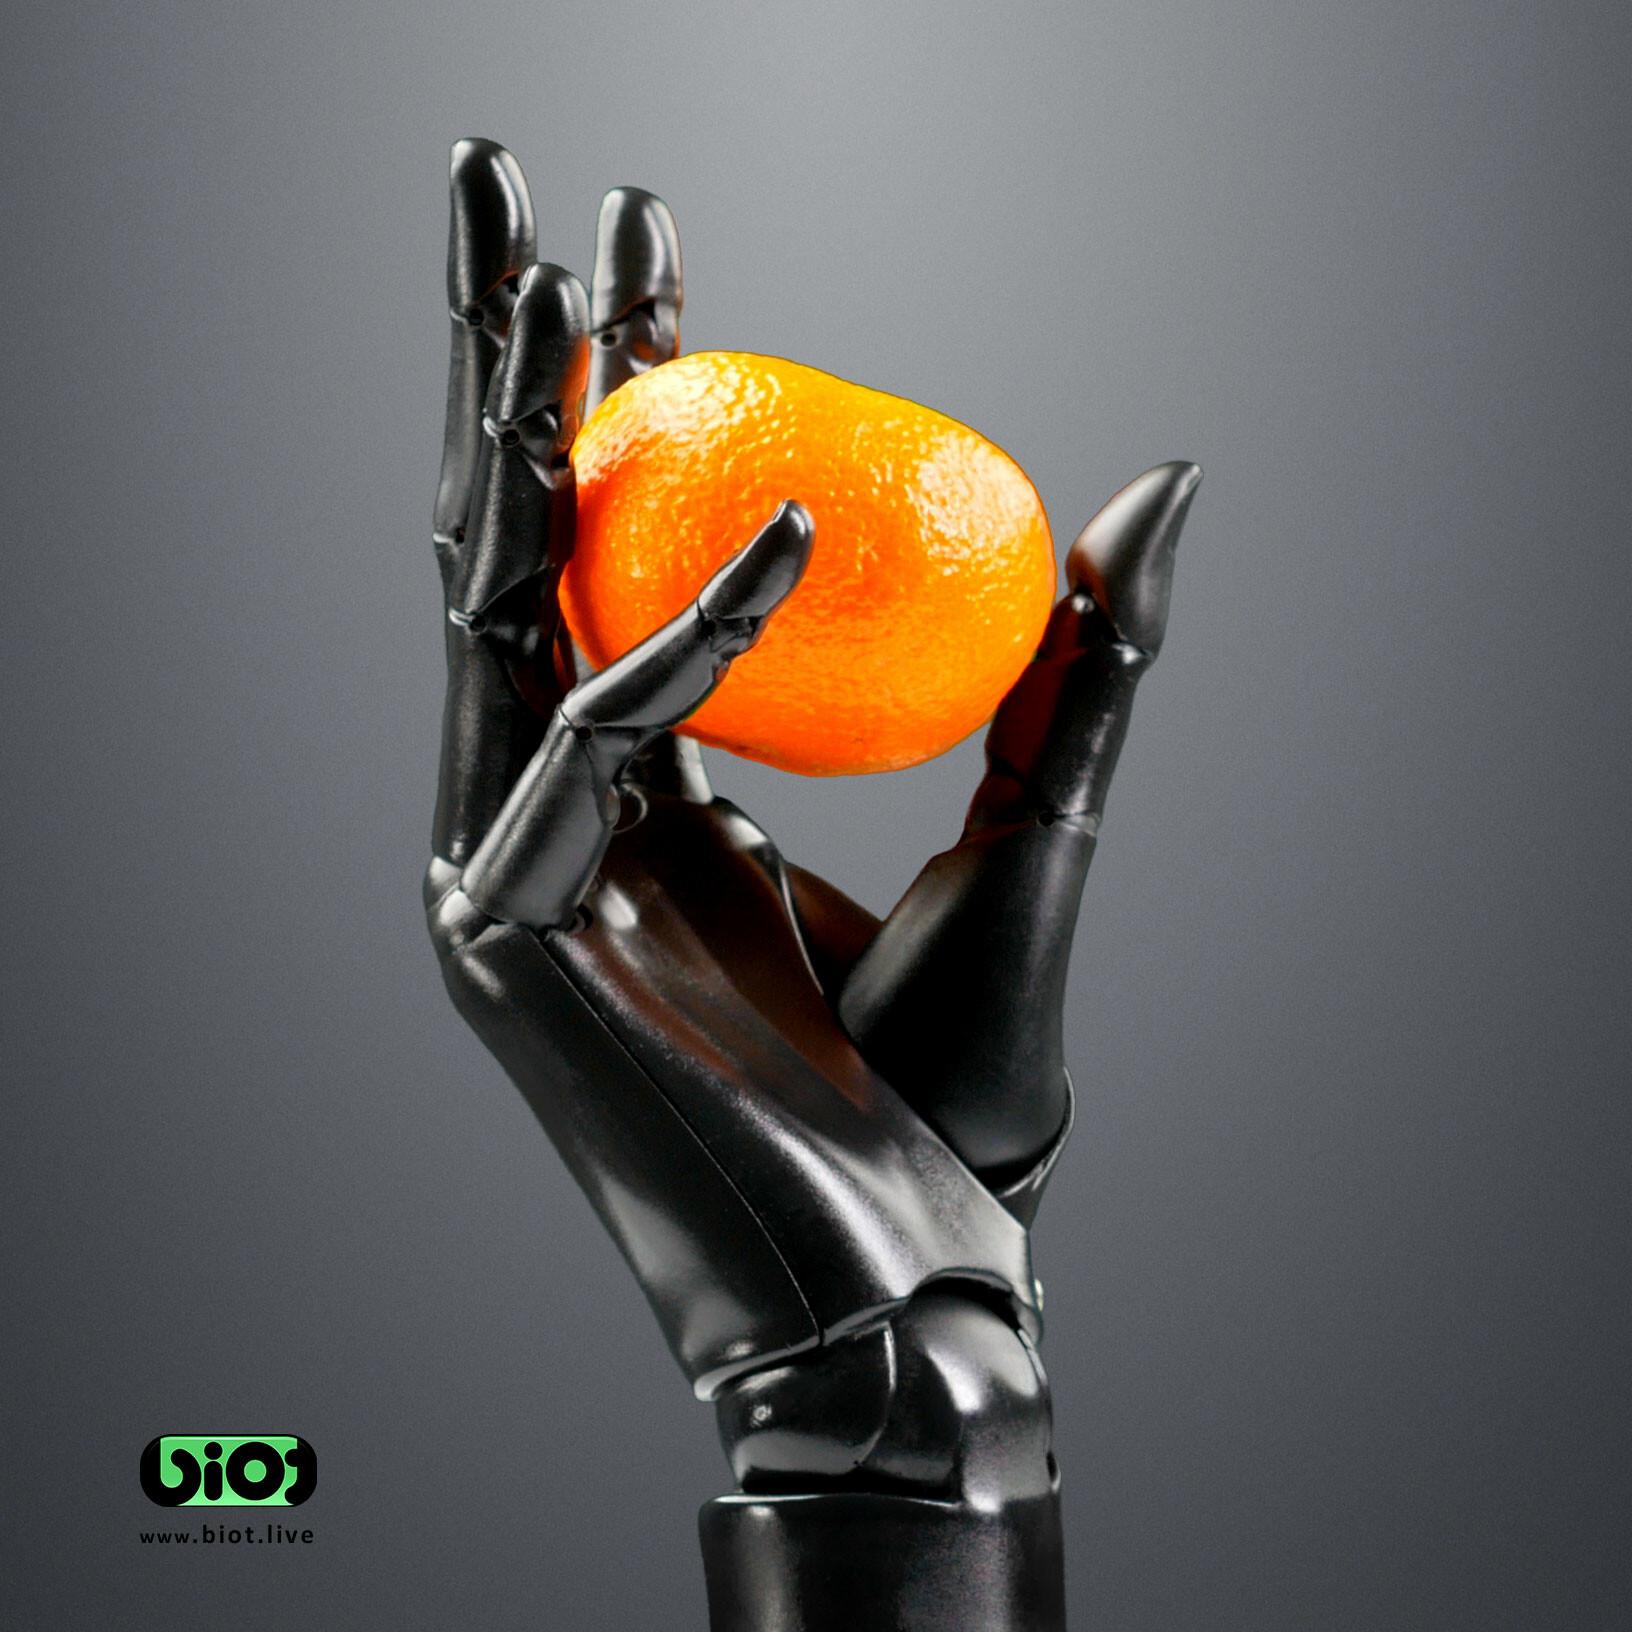 Sviatoslav gerasimchuk robotic hand biot hold a fruit